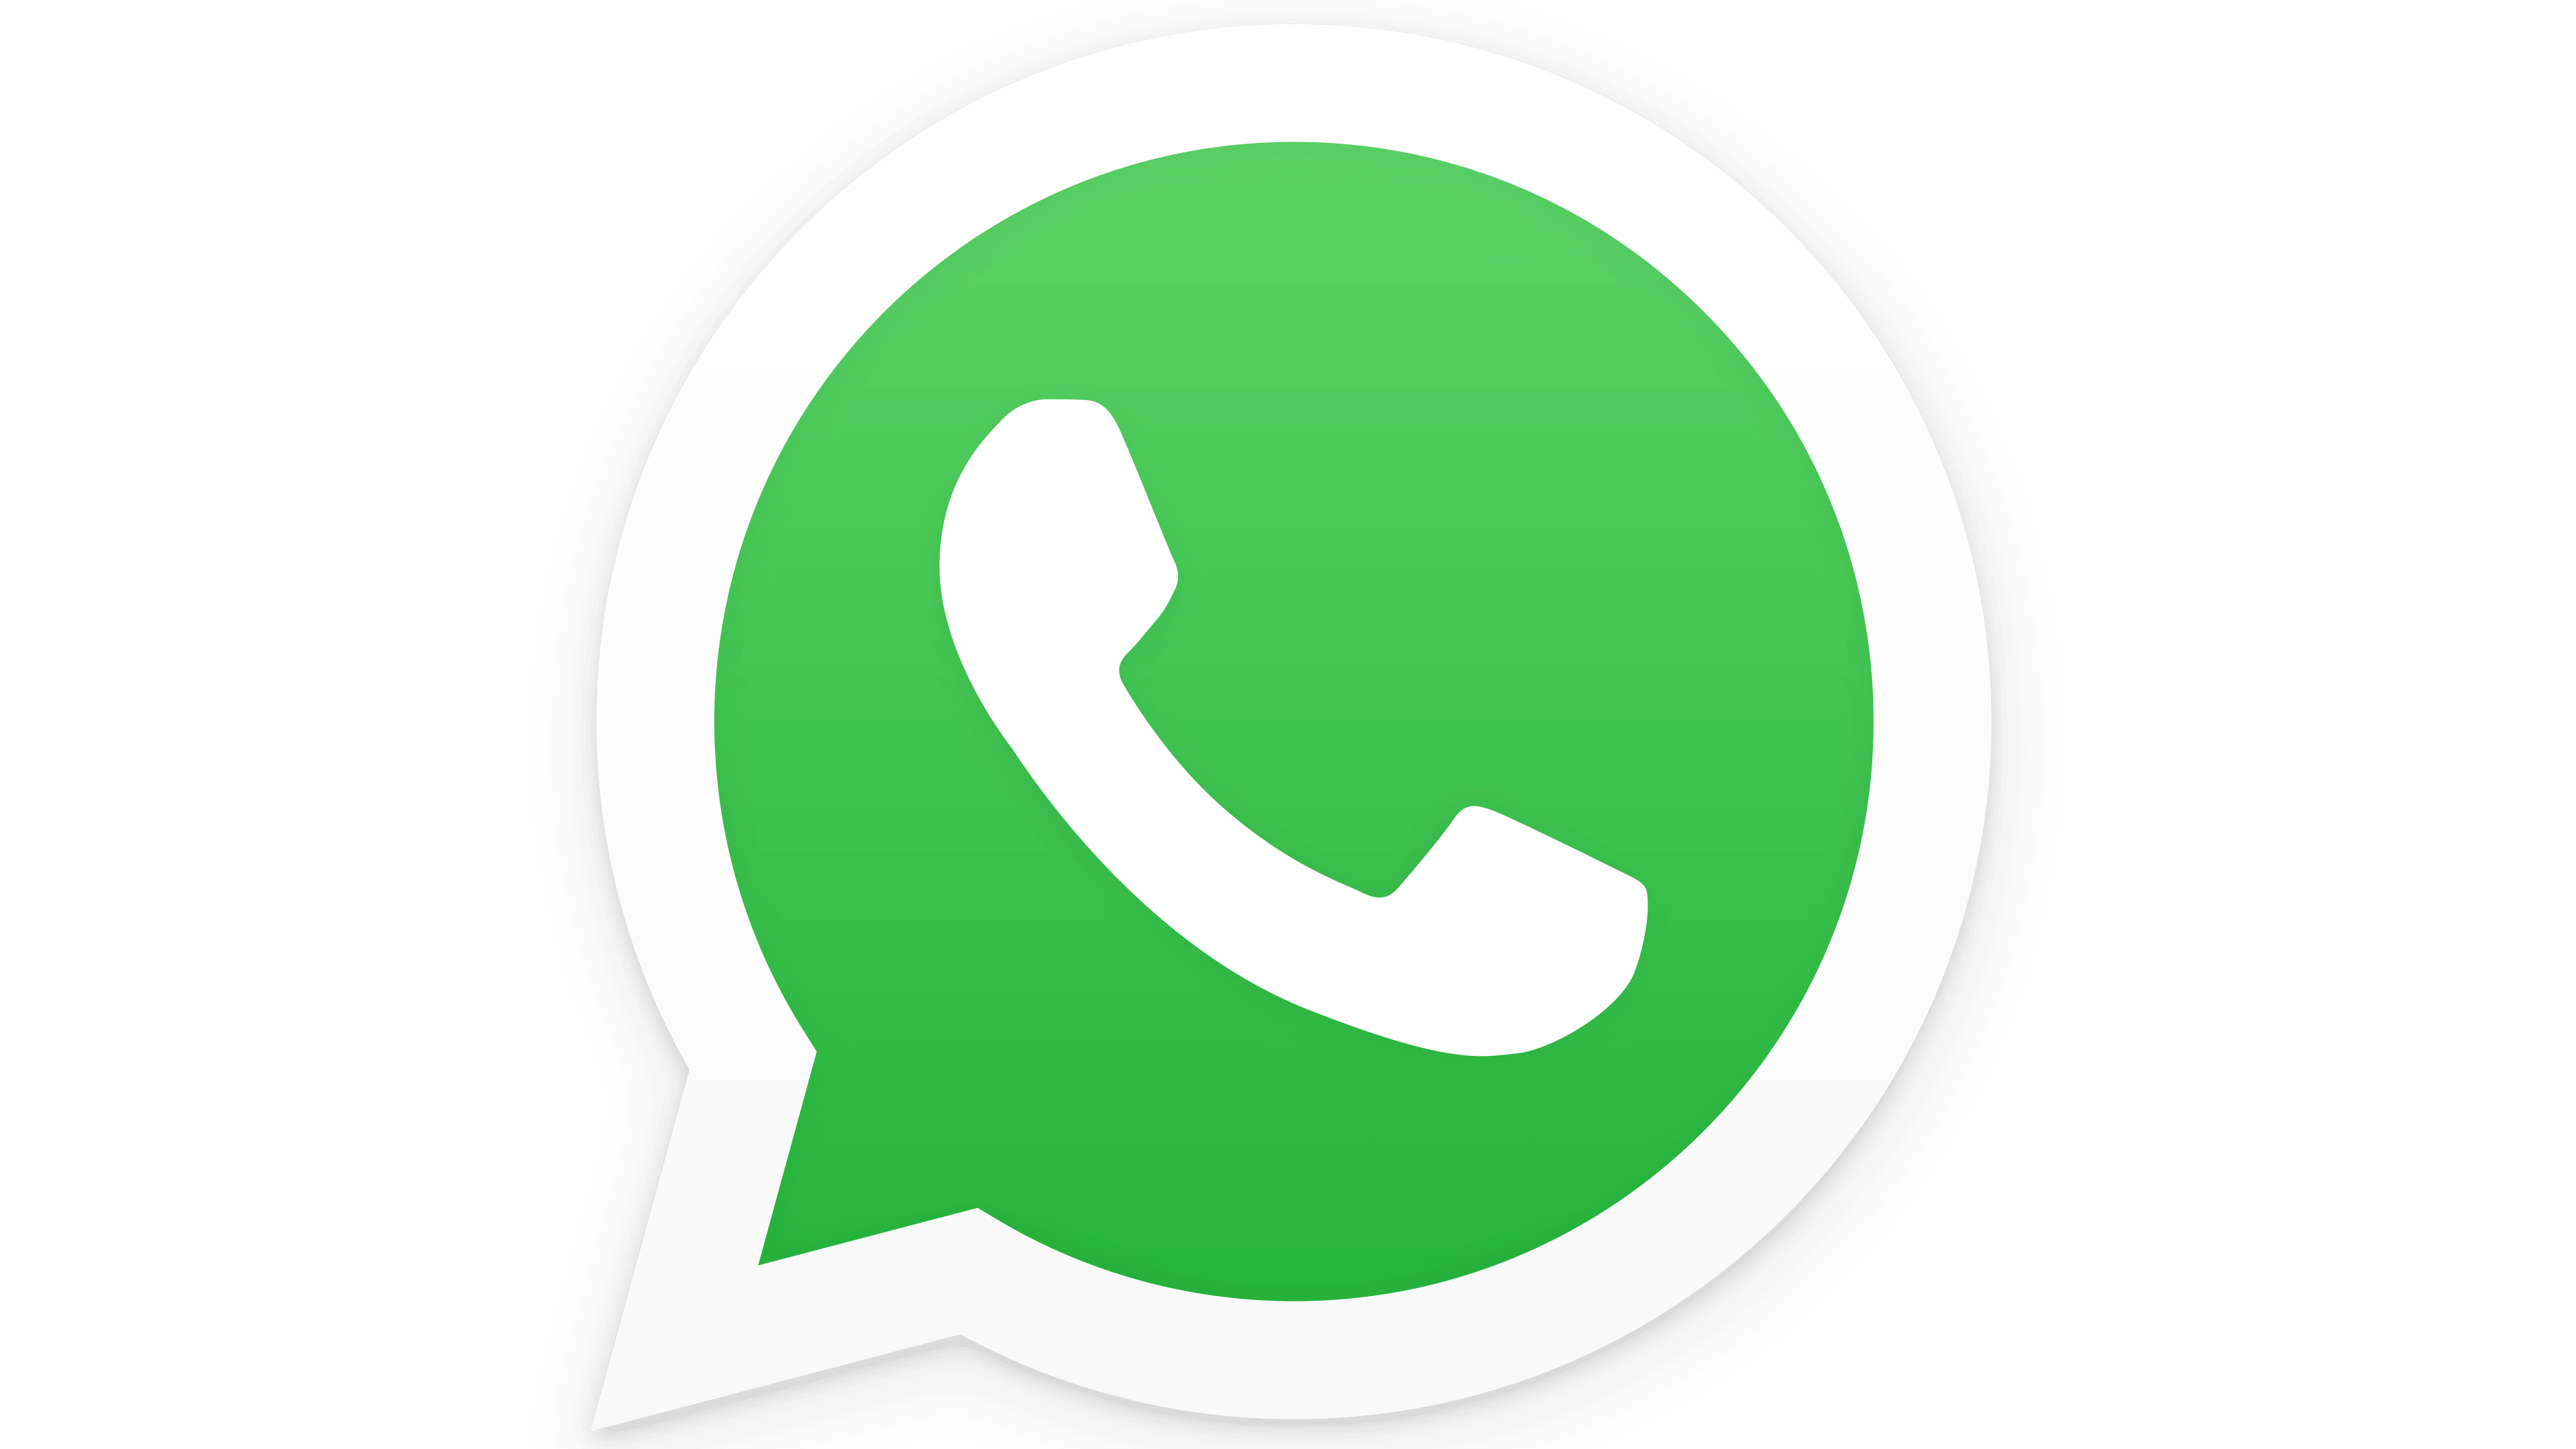 Whatsapp logo transparant